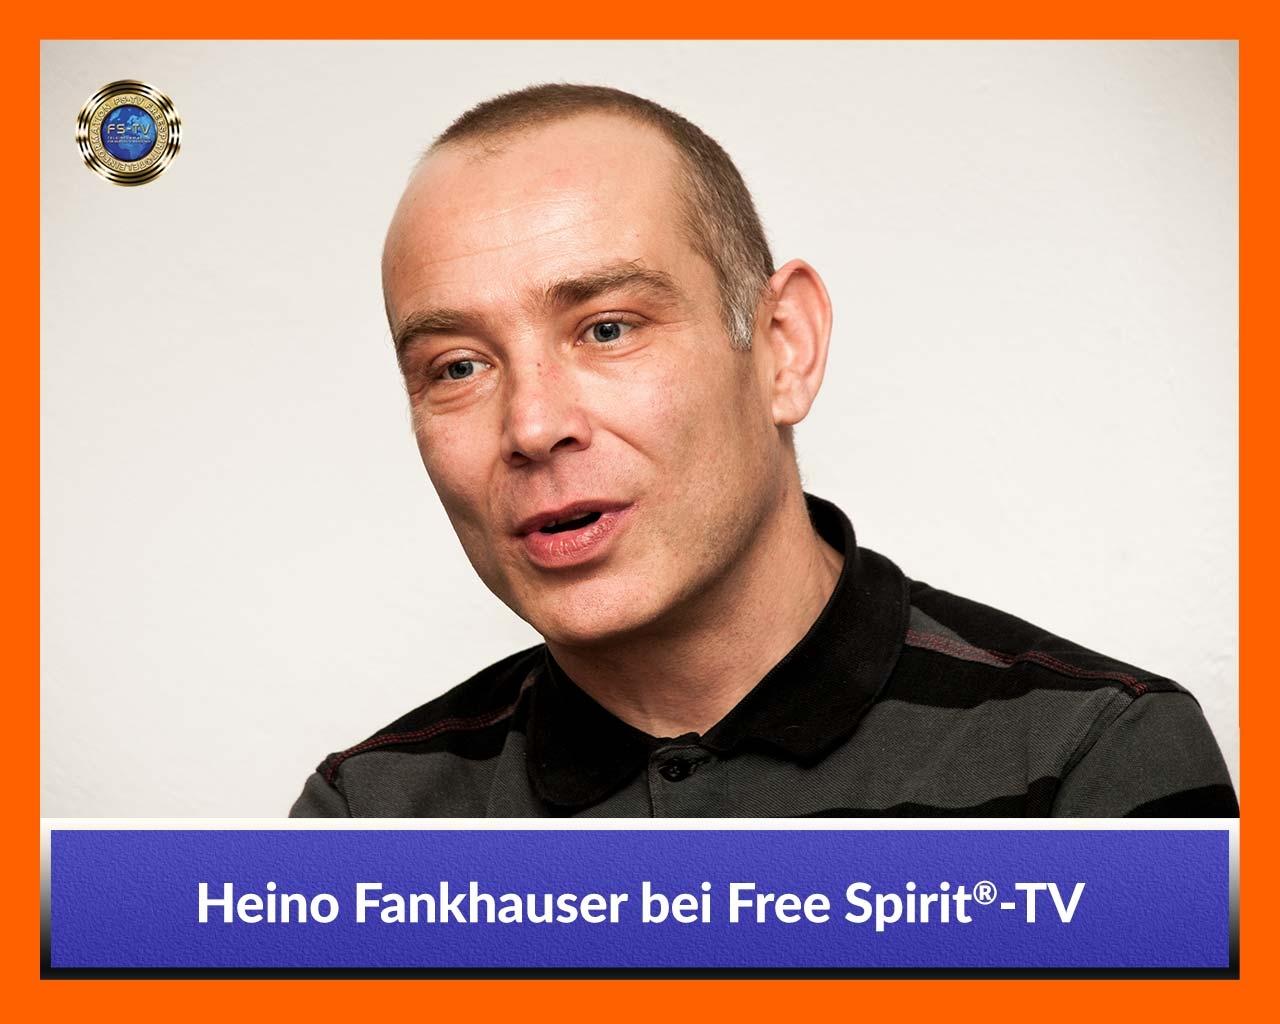 Heino-Fankhauser-04